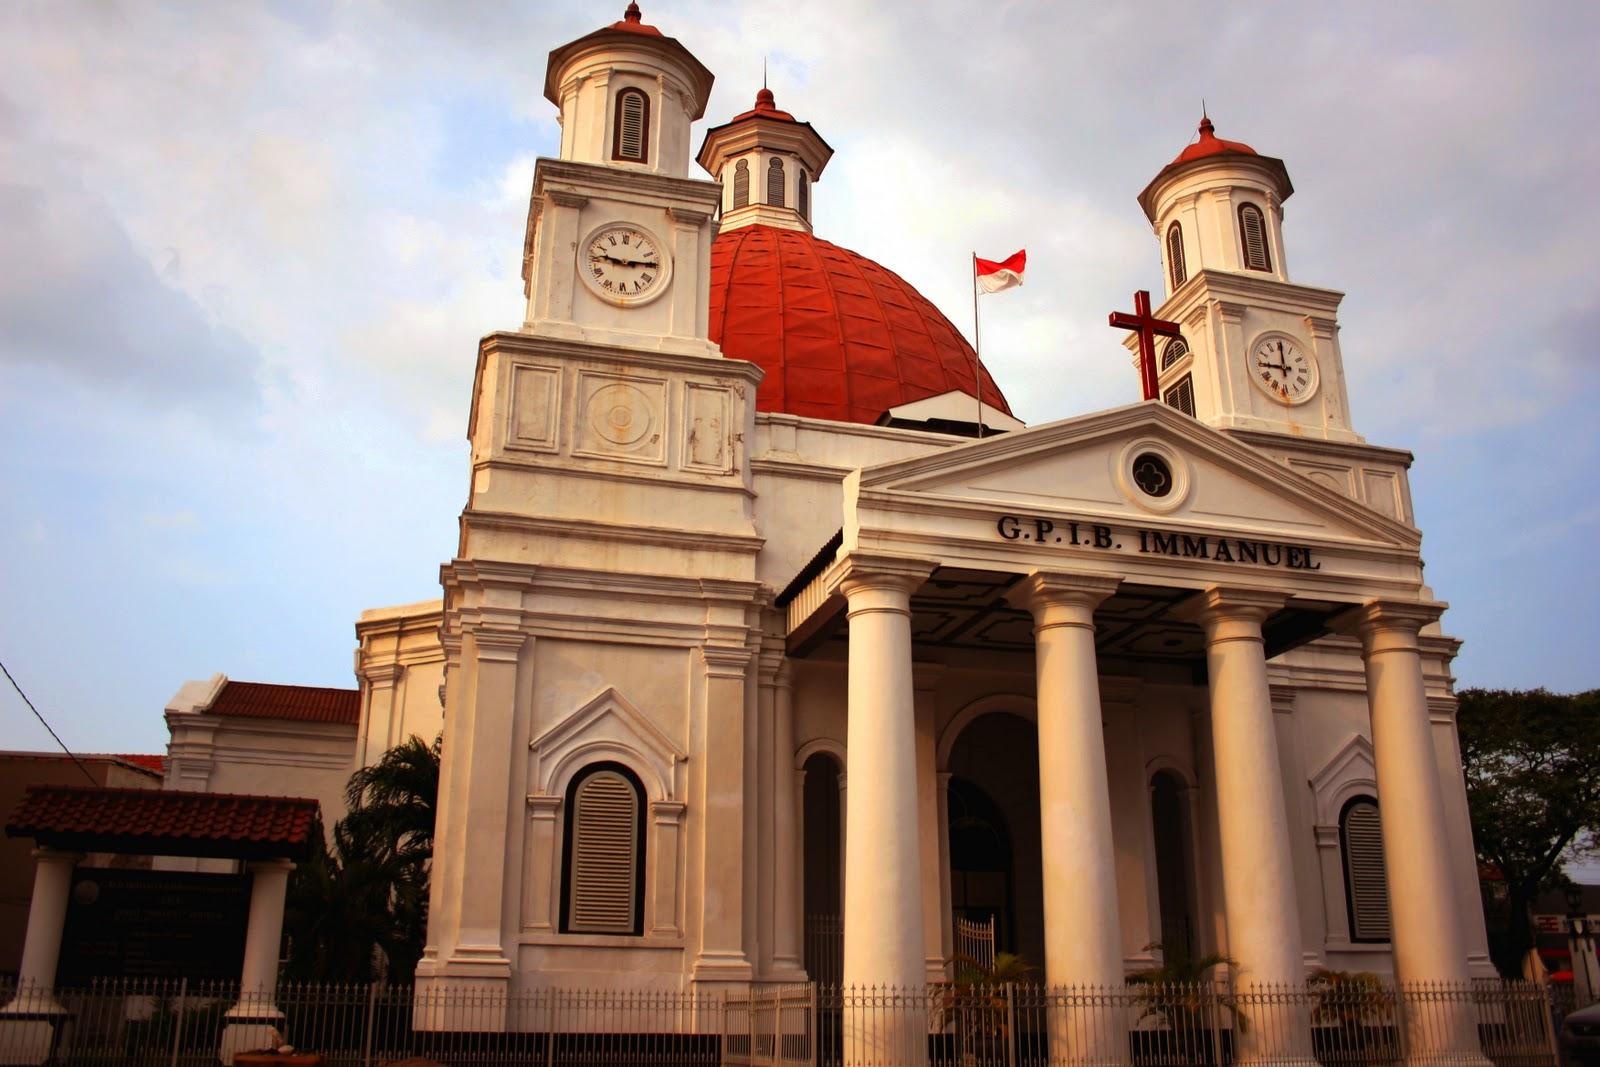 Daftar Bangunan Kuno Semarang Wajib Kamu Kunjungi Nikmati Netherland Kota